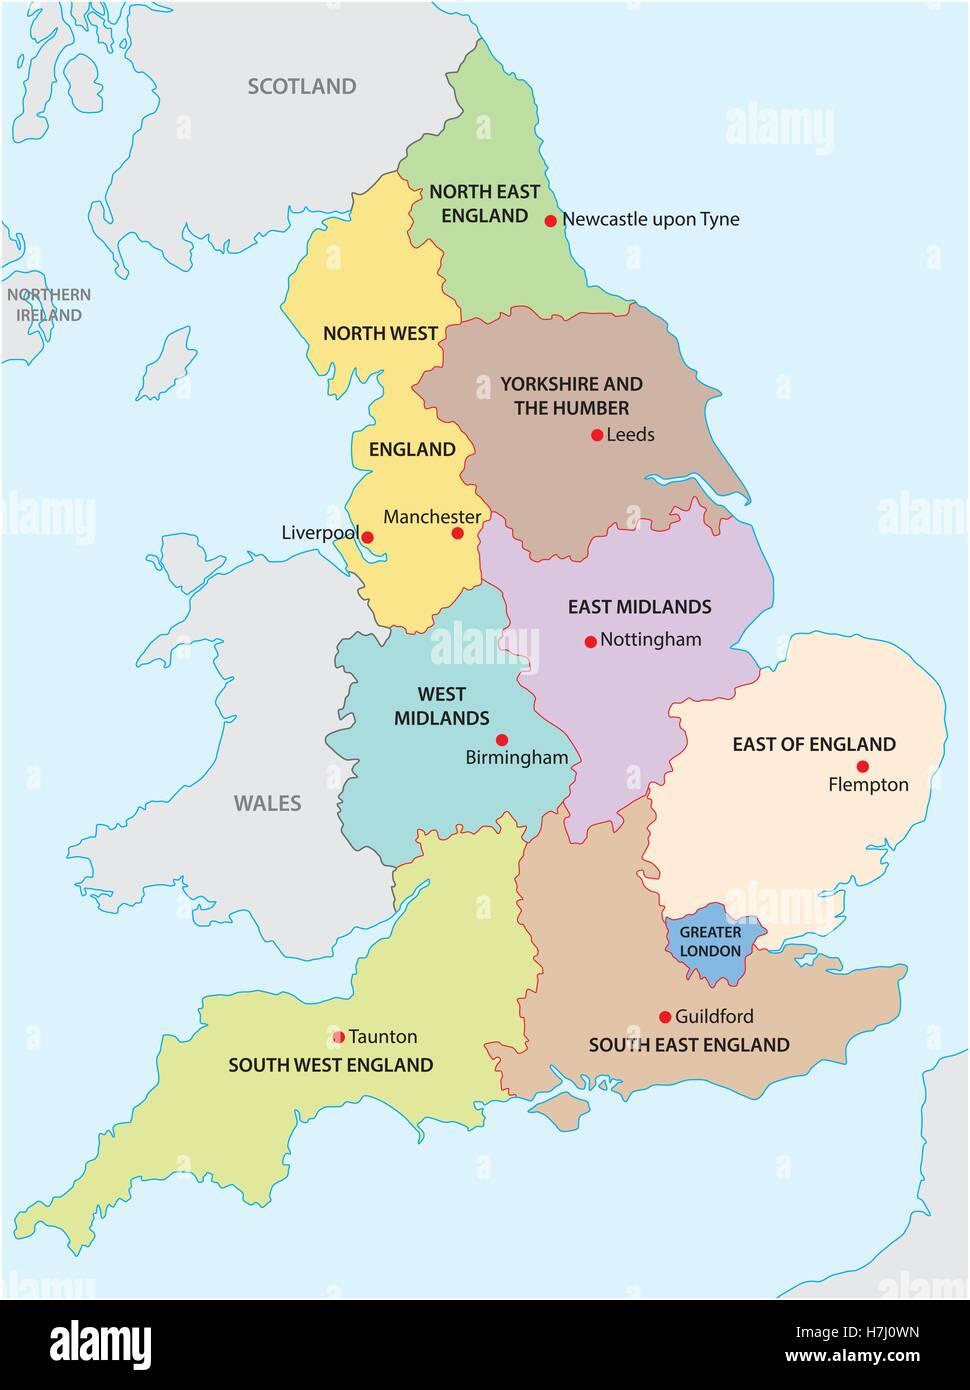 Cartina Gran Bretagna Regioni.North Of England Map Immagini E Fotos Stock Alamy